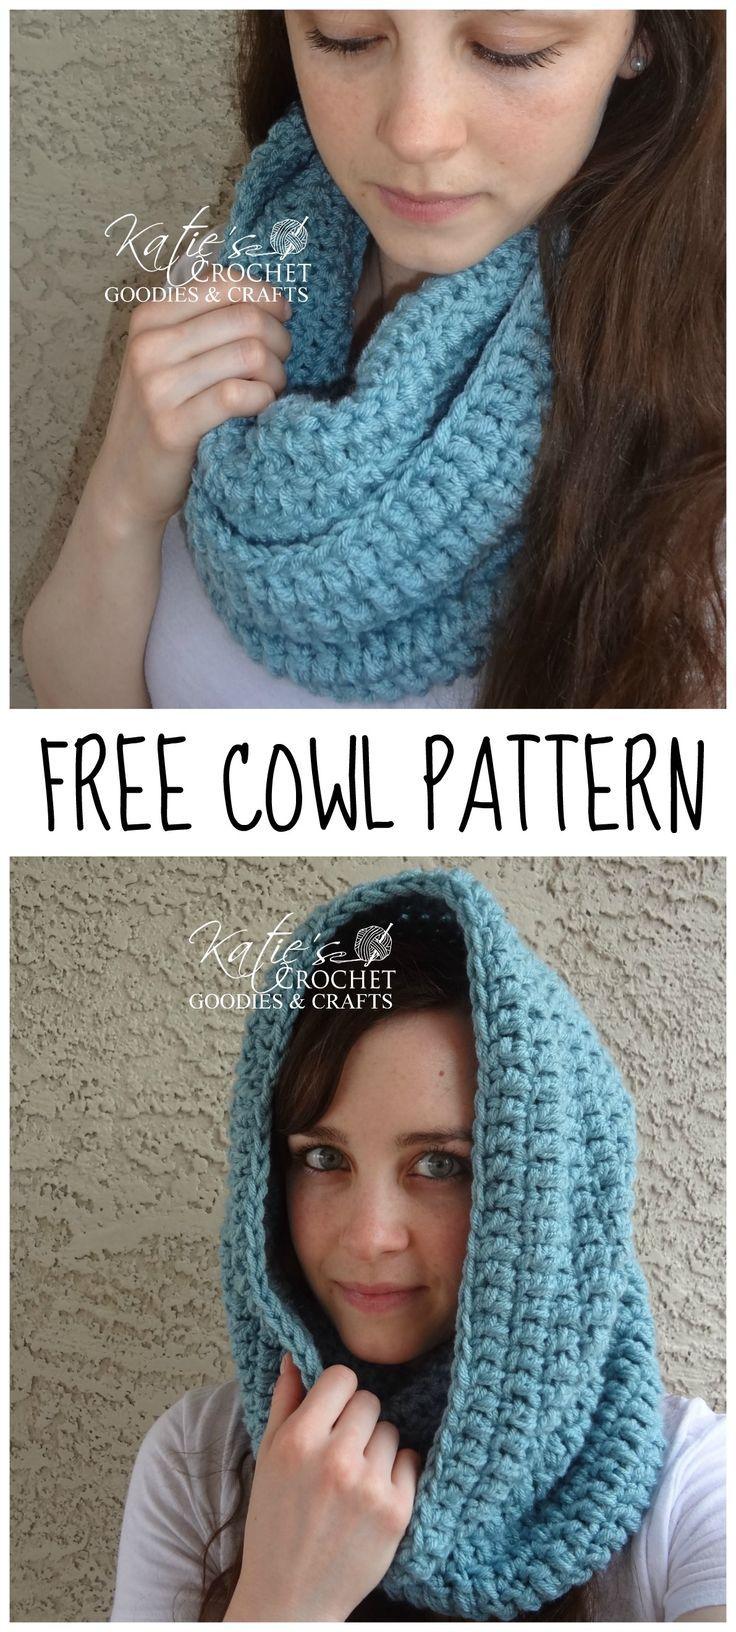 Free Easy Crochet Cowl Pattern by Katie's Crochet Goodies: